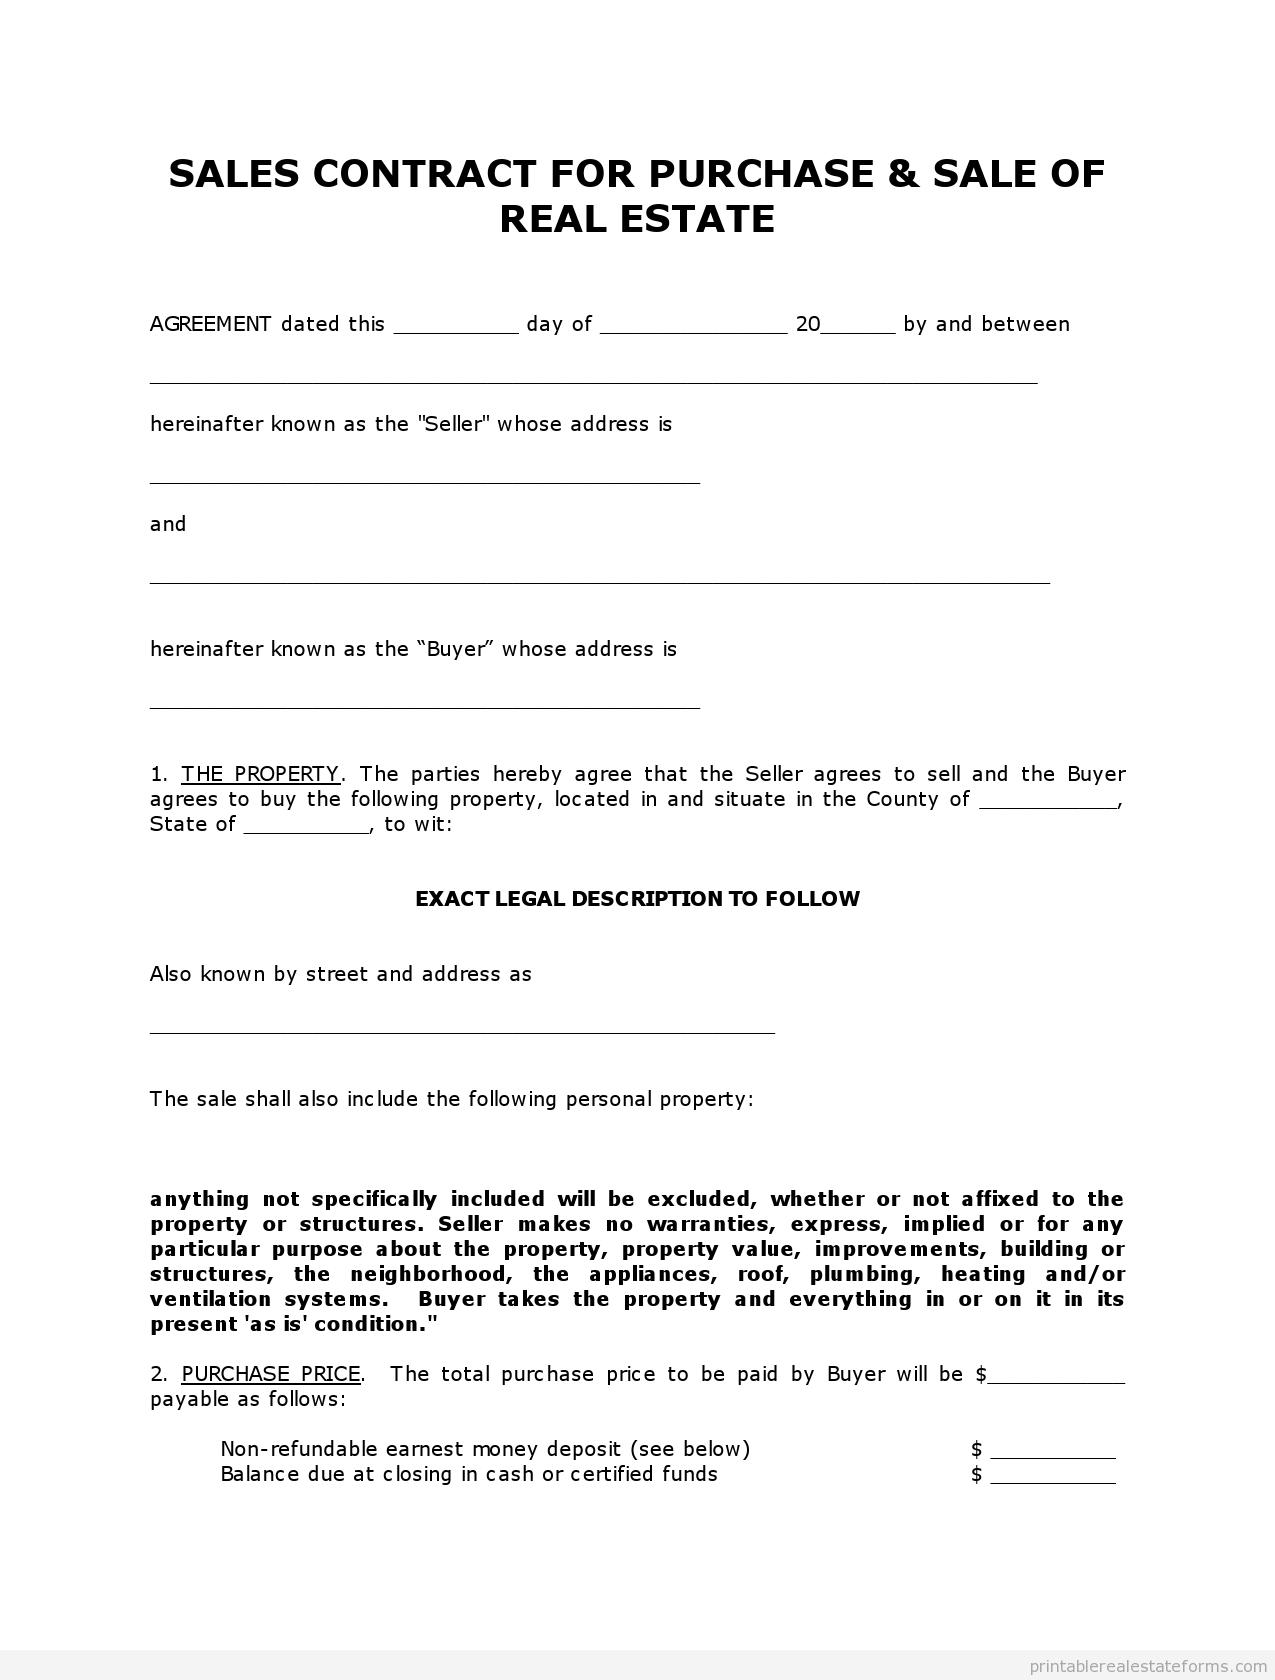 Get High Quality Printable Simple Land Contract Form. Editable - Free Printable Land Contract Forms